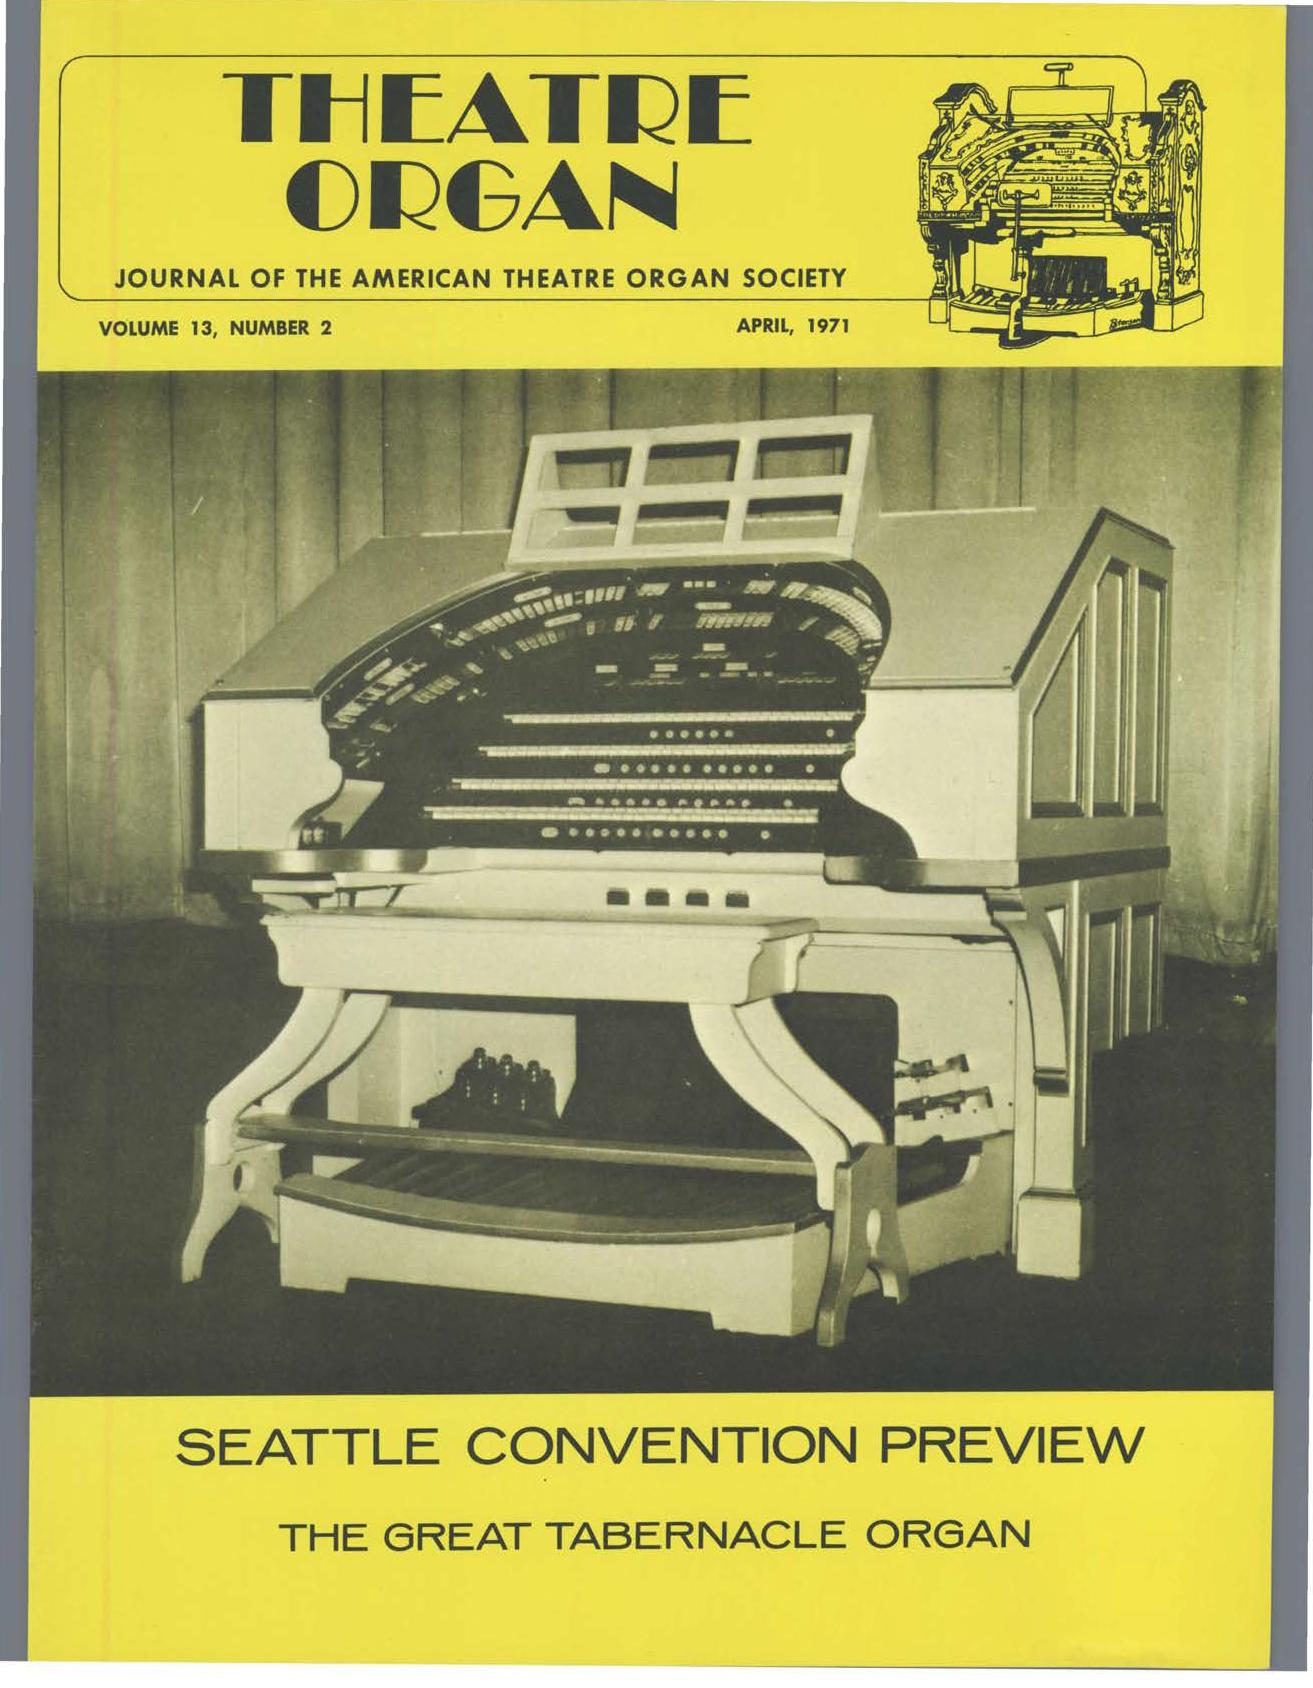 Theatre Organ, April 1971, Volume 13, Number 2